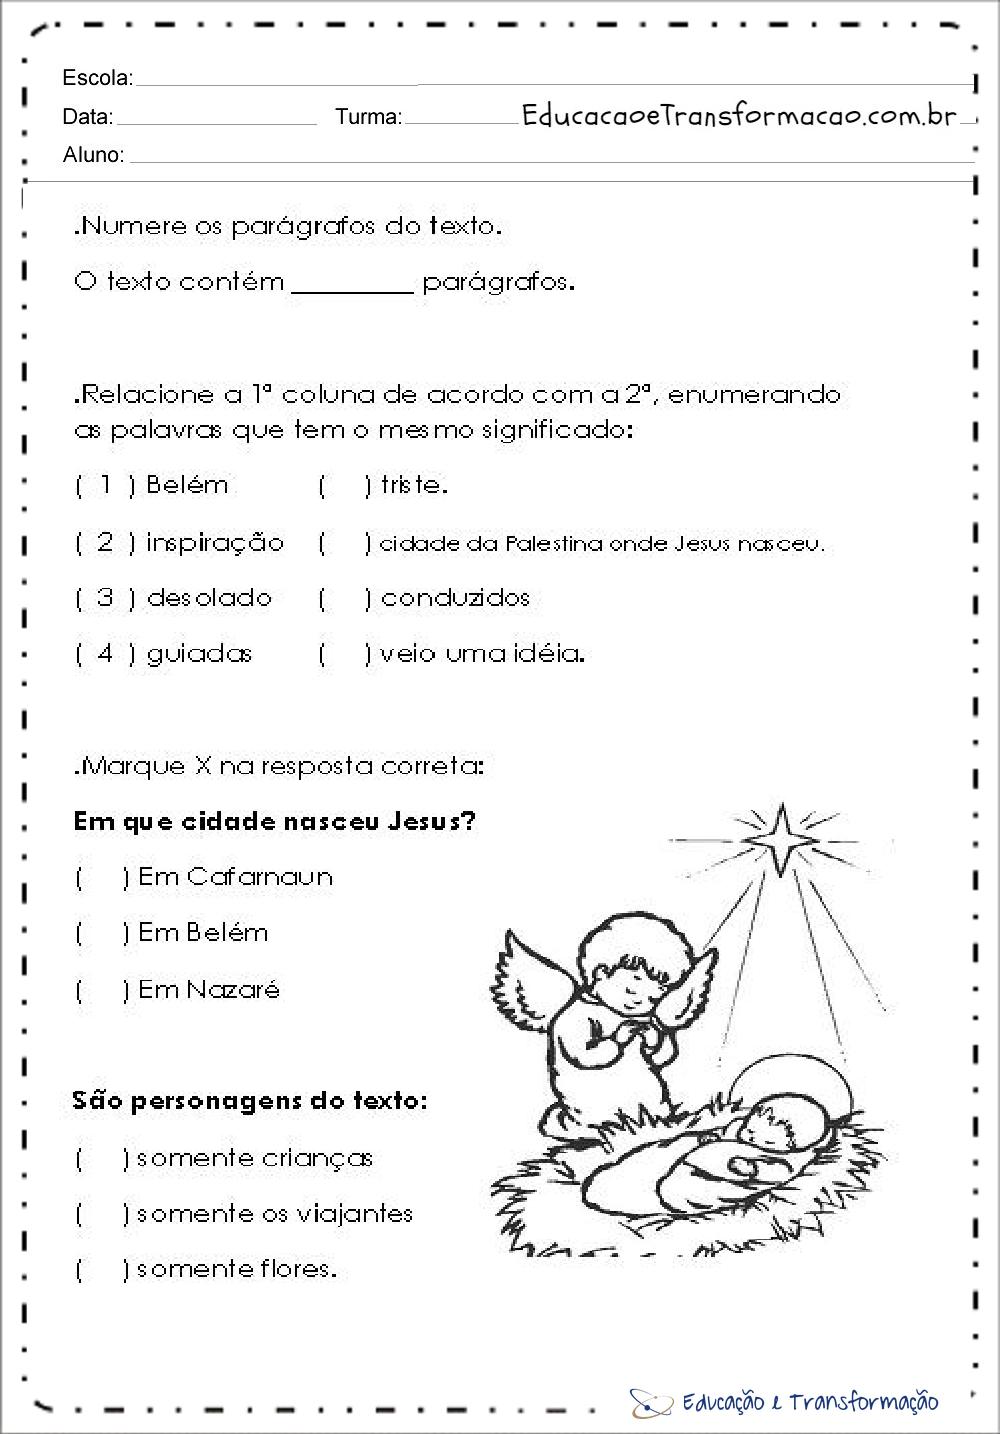 Atividades de Natal 4 ano do Ensino Fundamental